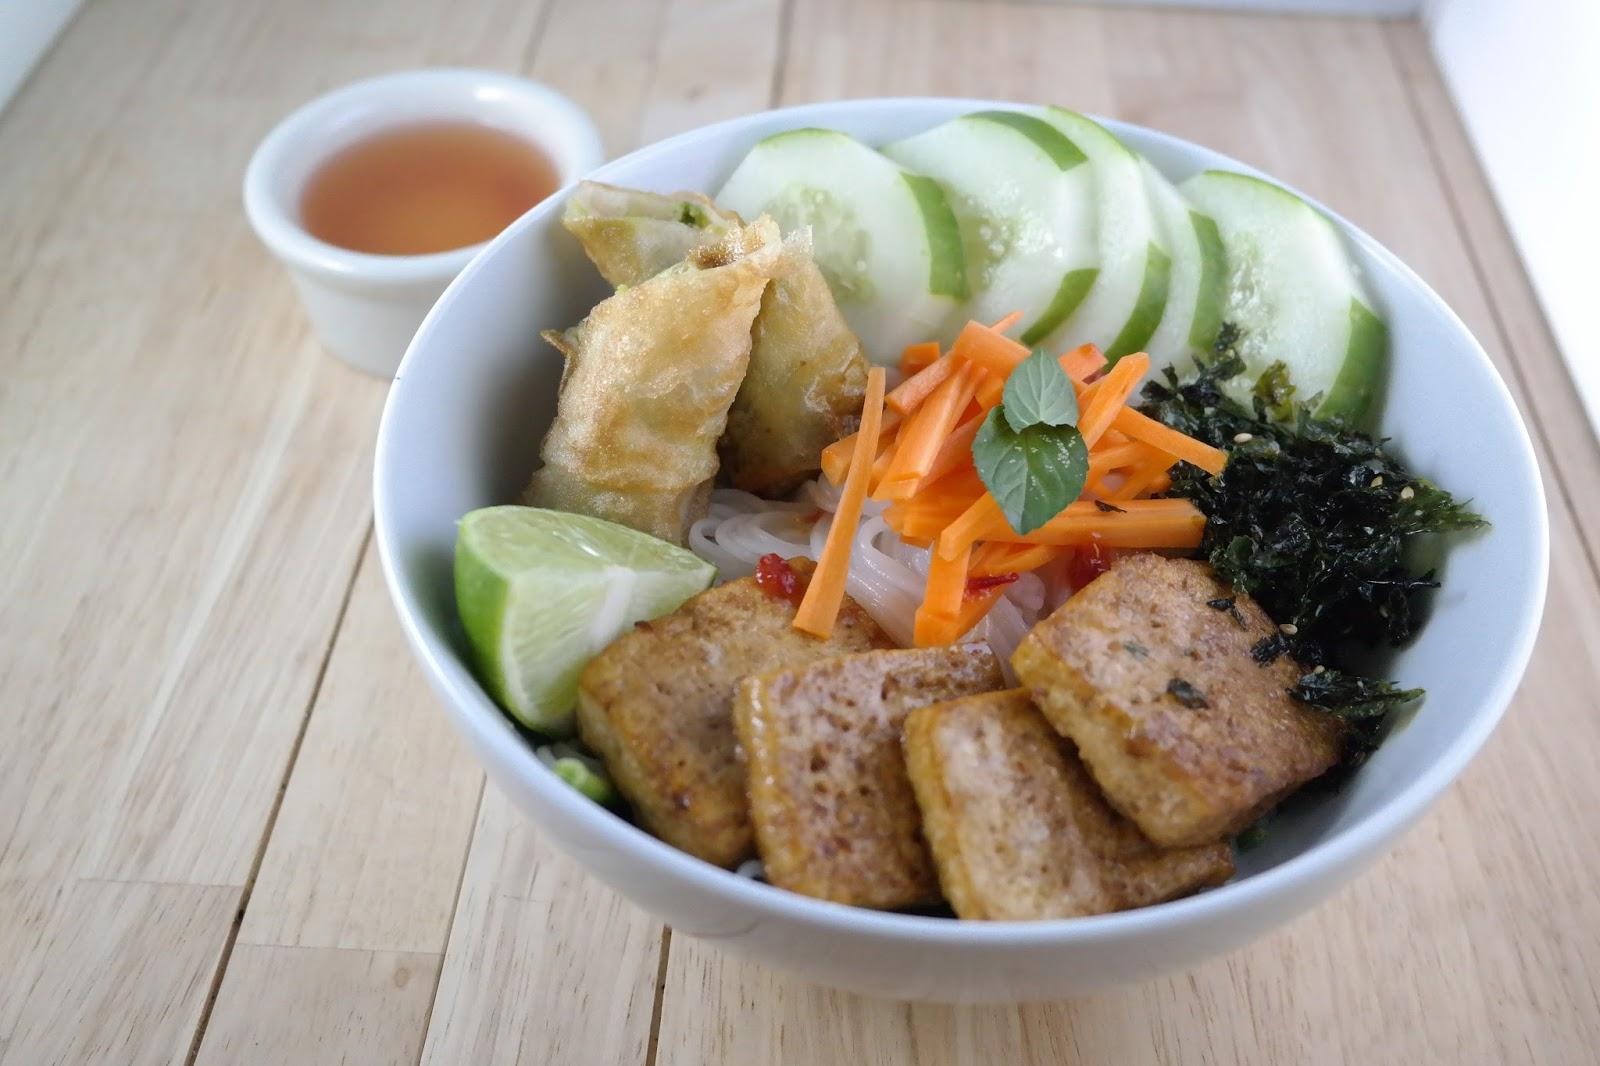 Bun chay vegetarian vietnamese vermicelli bowl for Vegetarian fish sauce